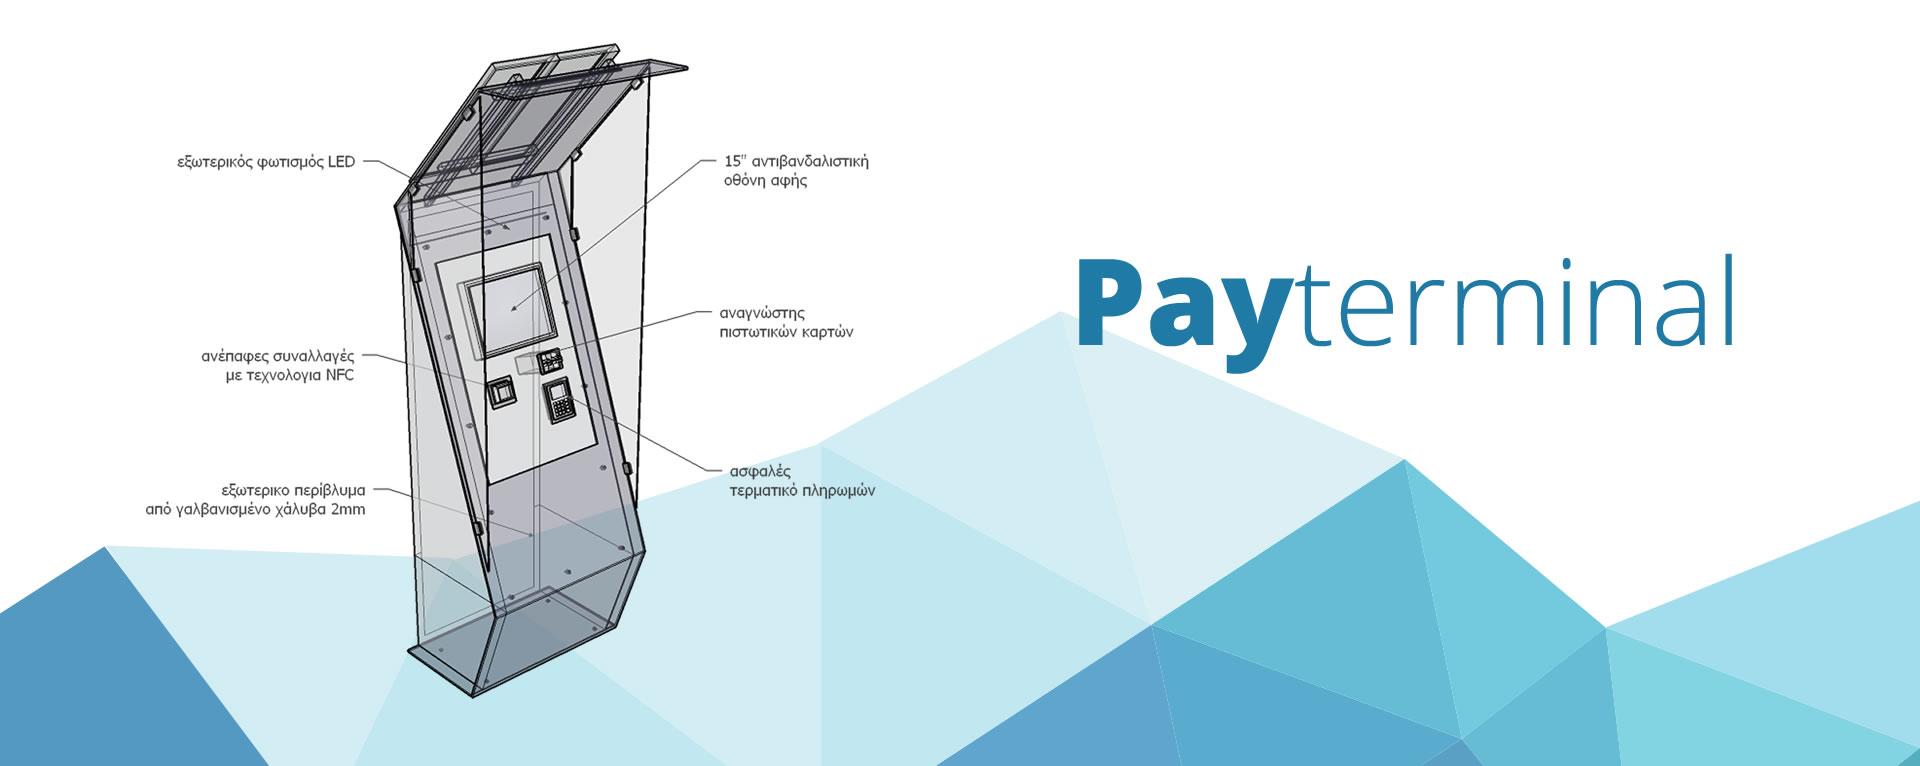 payterminal_post